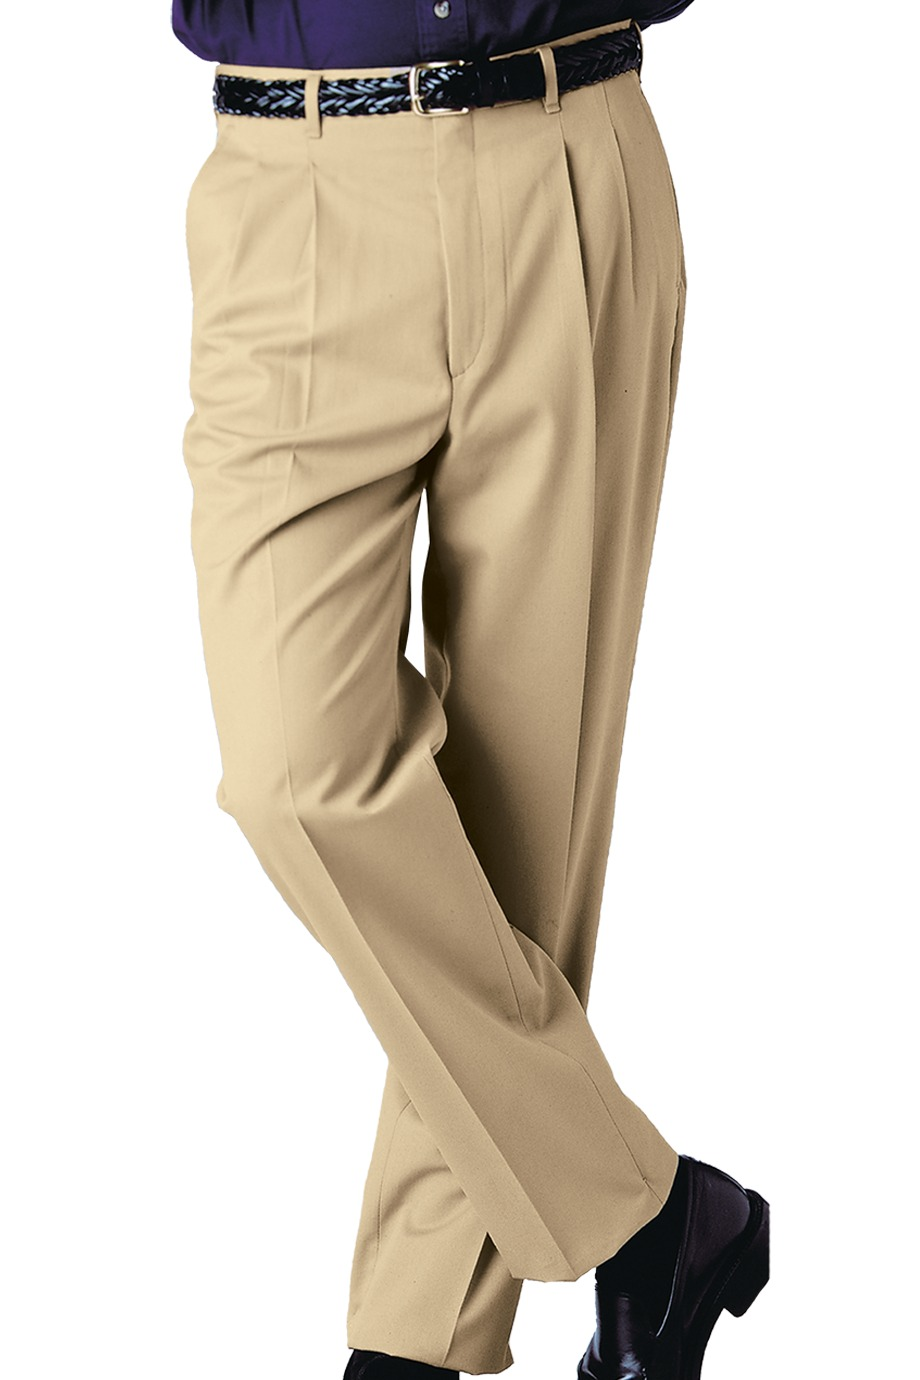 Edwards Garment 2610 - Menu0026#39;s Business Casual Pleated Pant $29.60 - Menu0026#39;s Pants